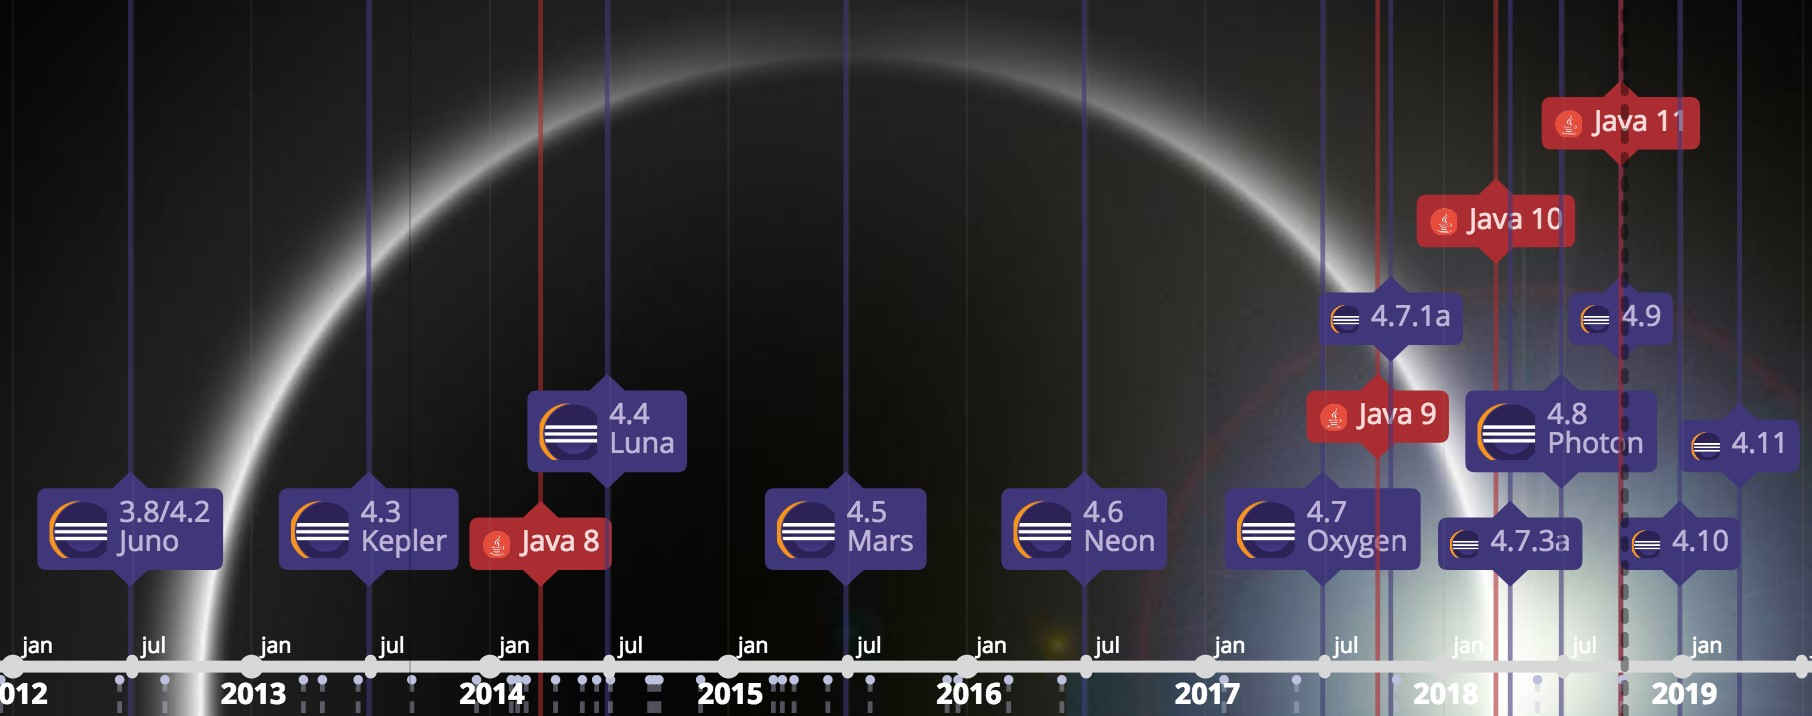 Java & Eclipse Release-Timeline. (Abb. 1)